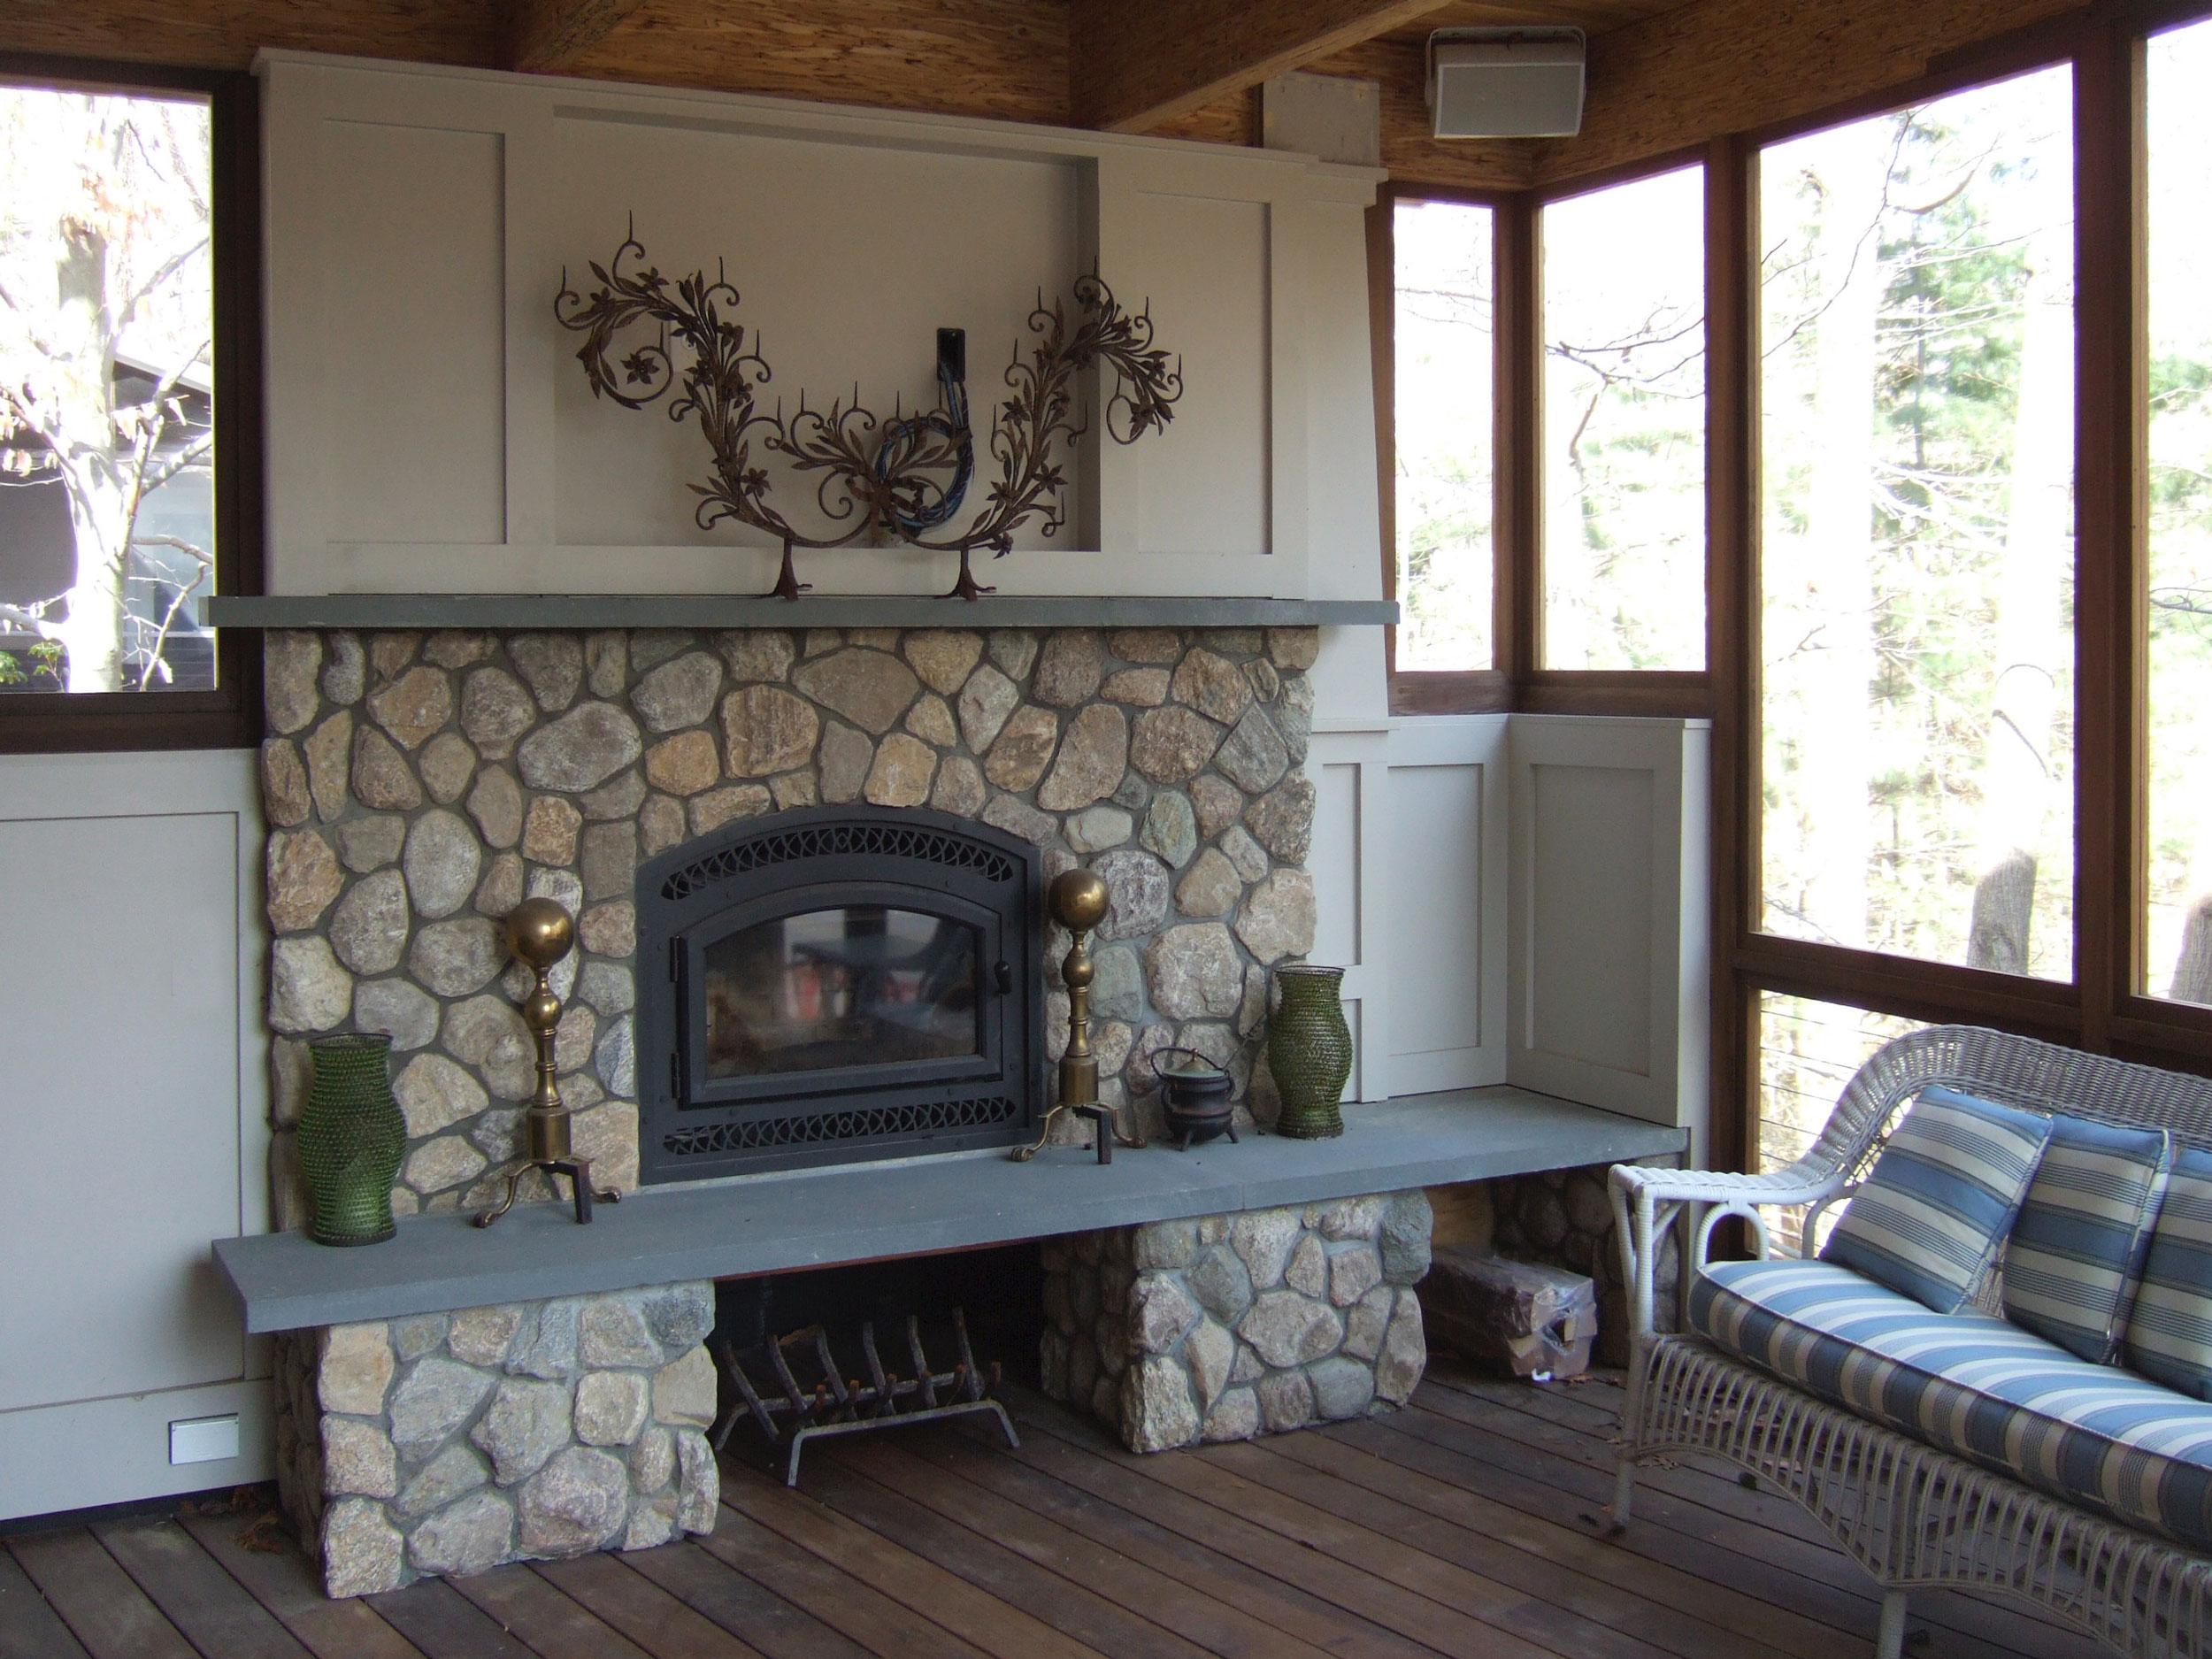 Rowayton-LEED-Gold-porch-fireplace.jpg